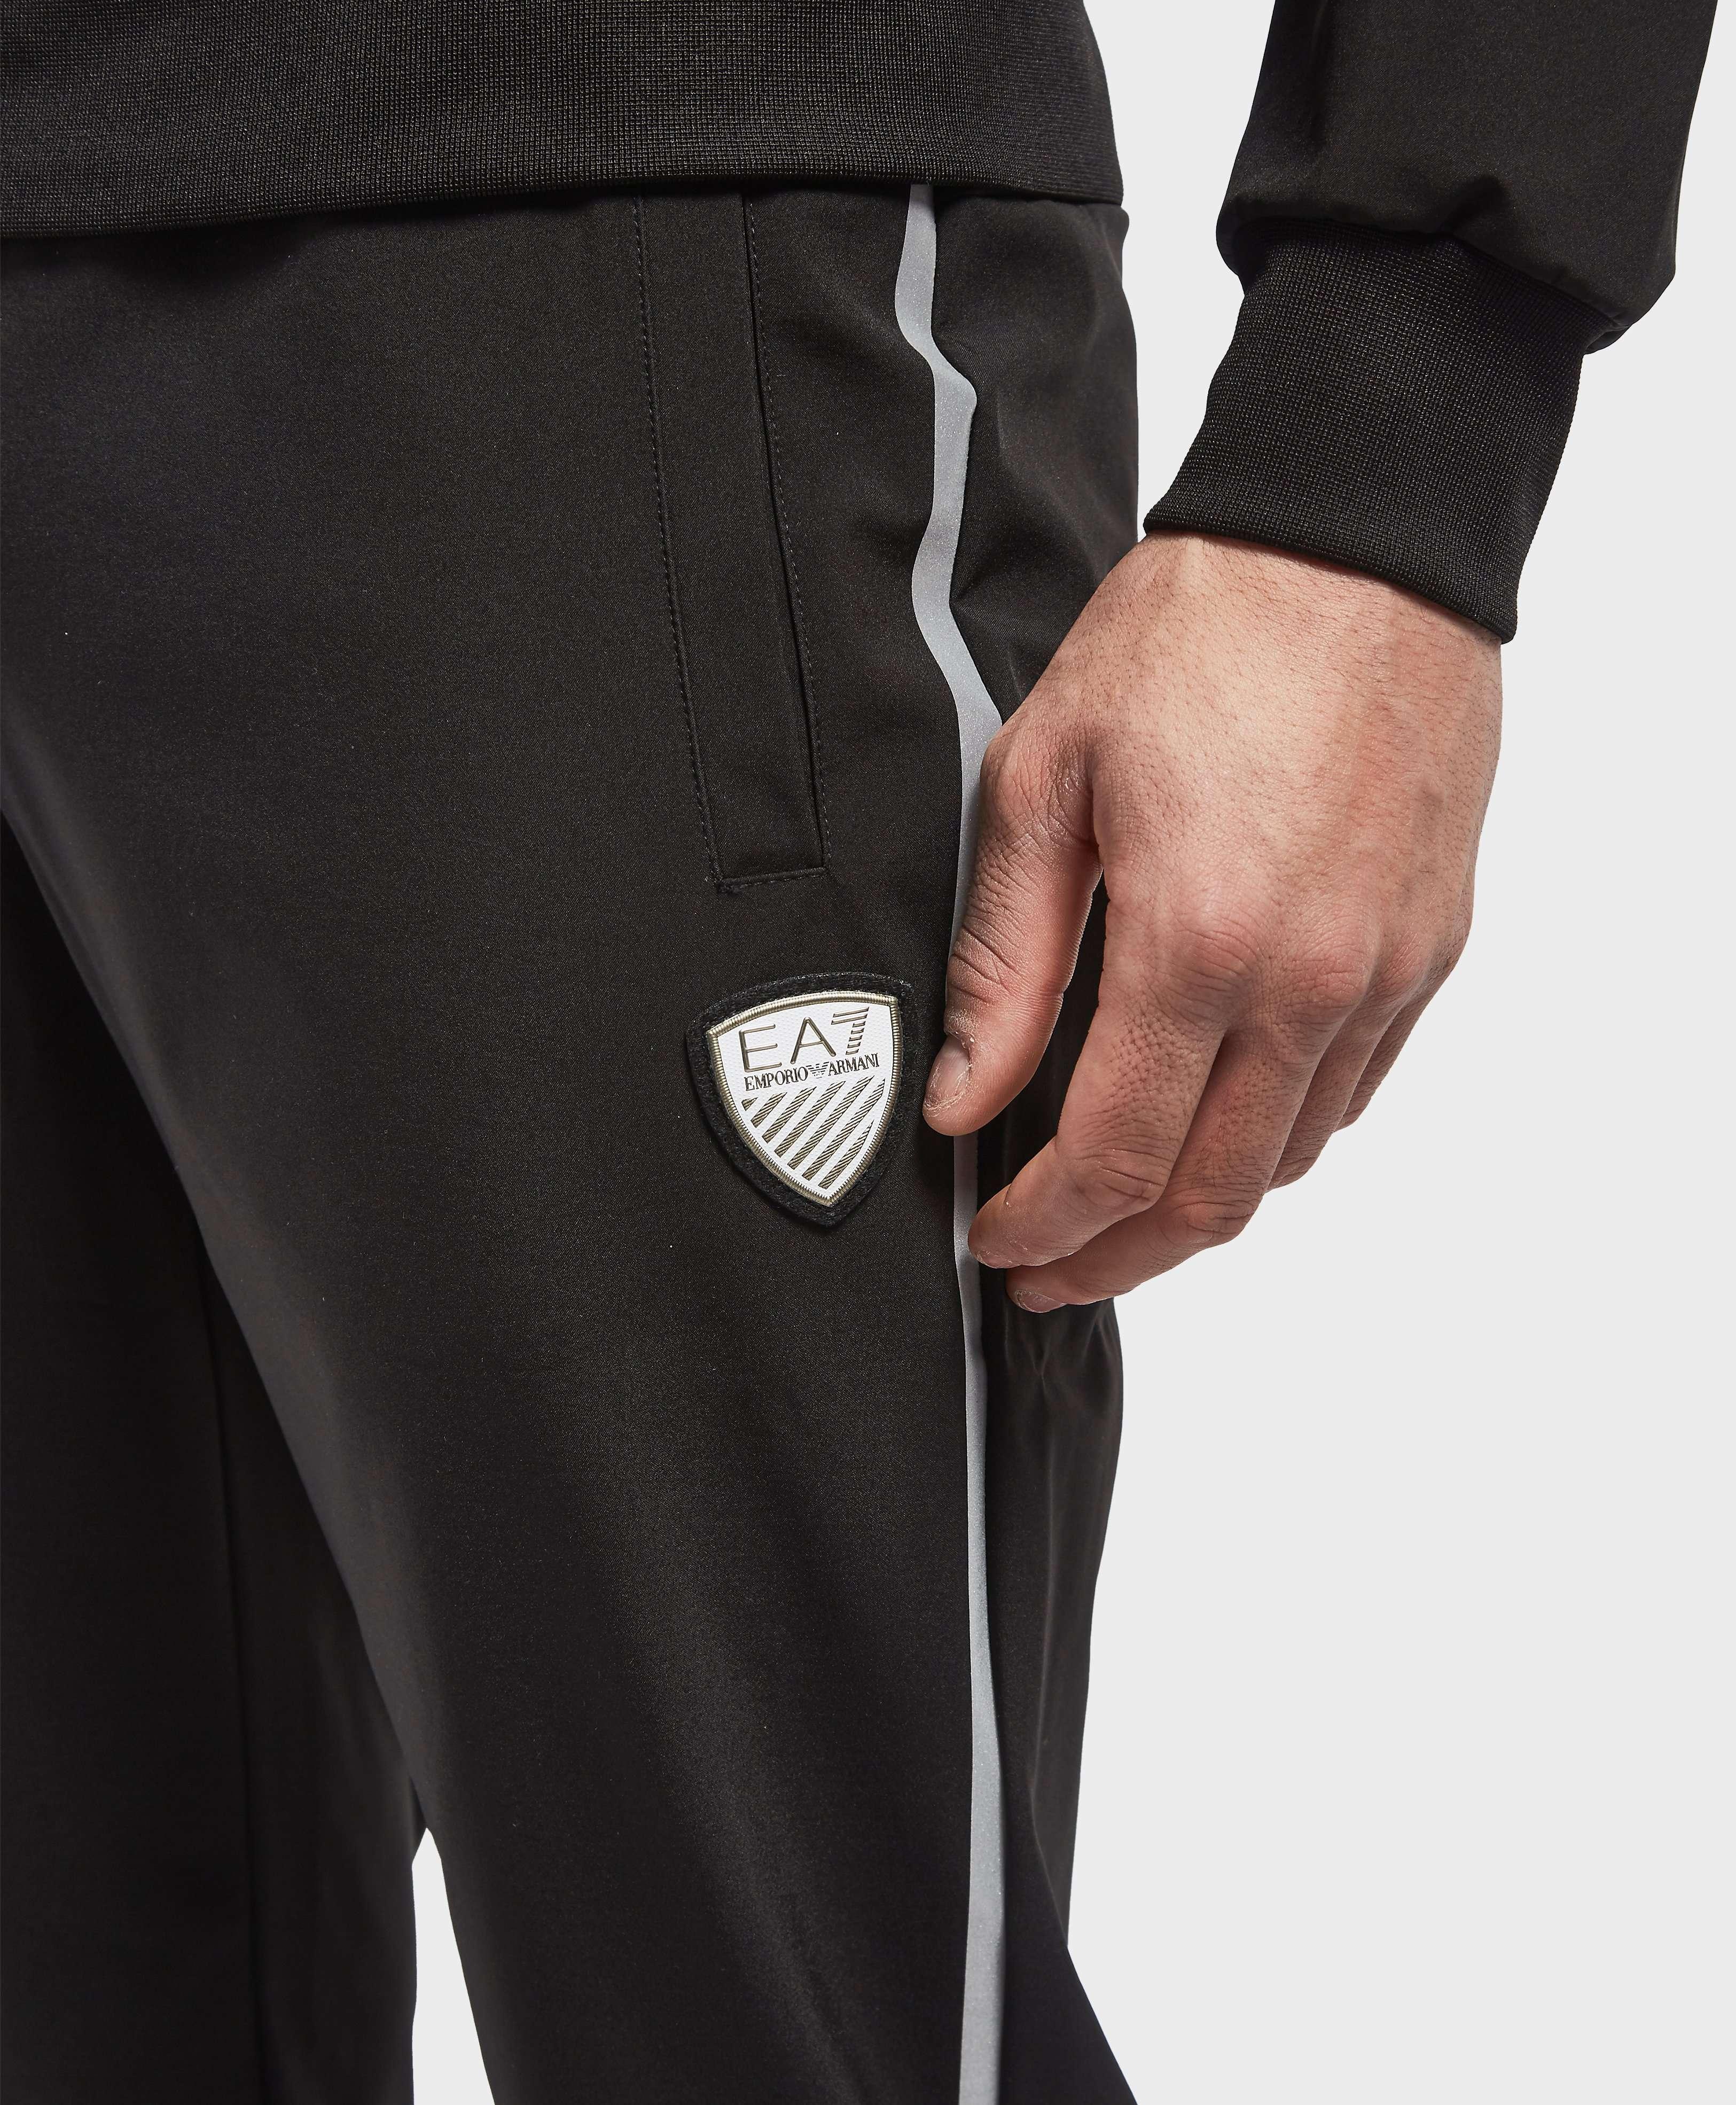 Emporio Armani EA7 Softshell Cuffed Track Pants - Exclusive